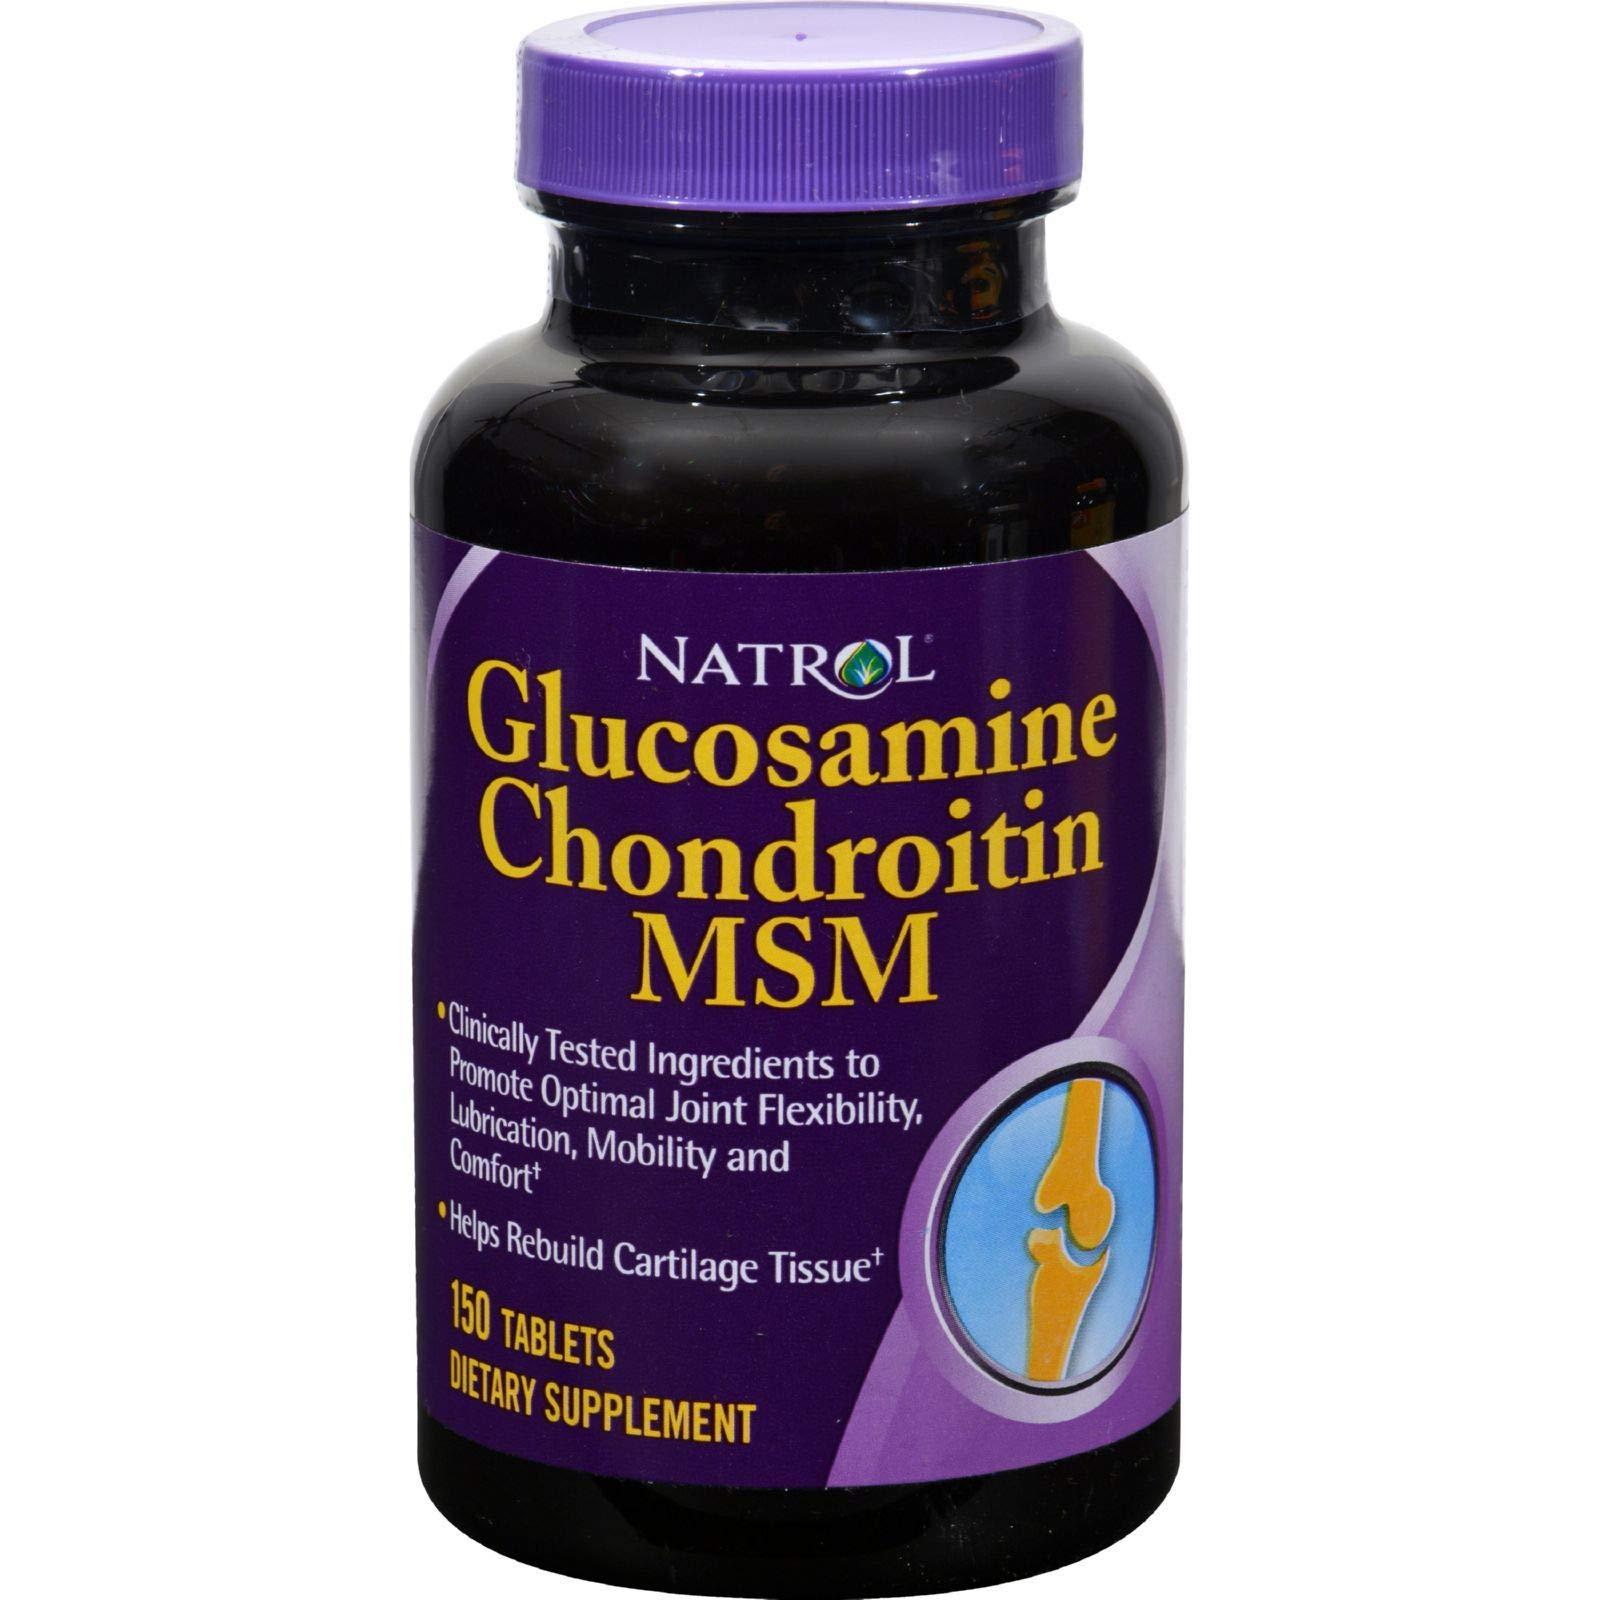 Natrol Glucosamine Chondroitin MSM 150 Tablets by Natrol